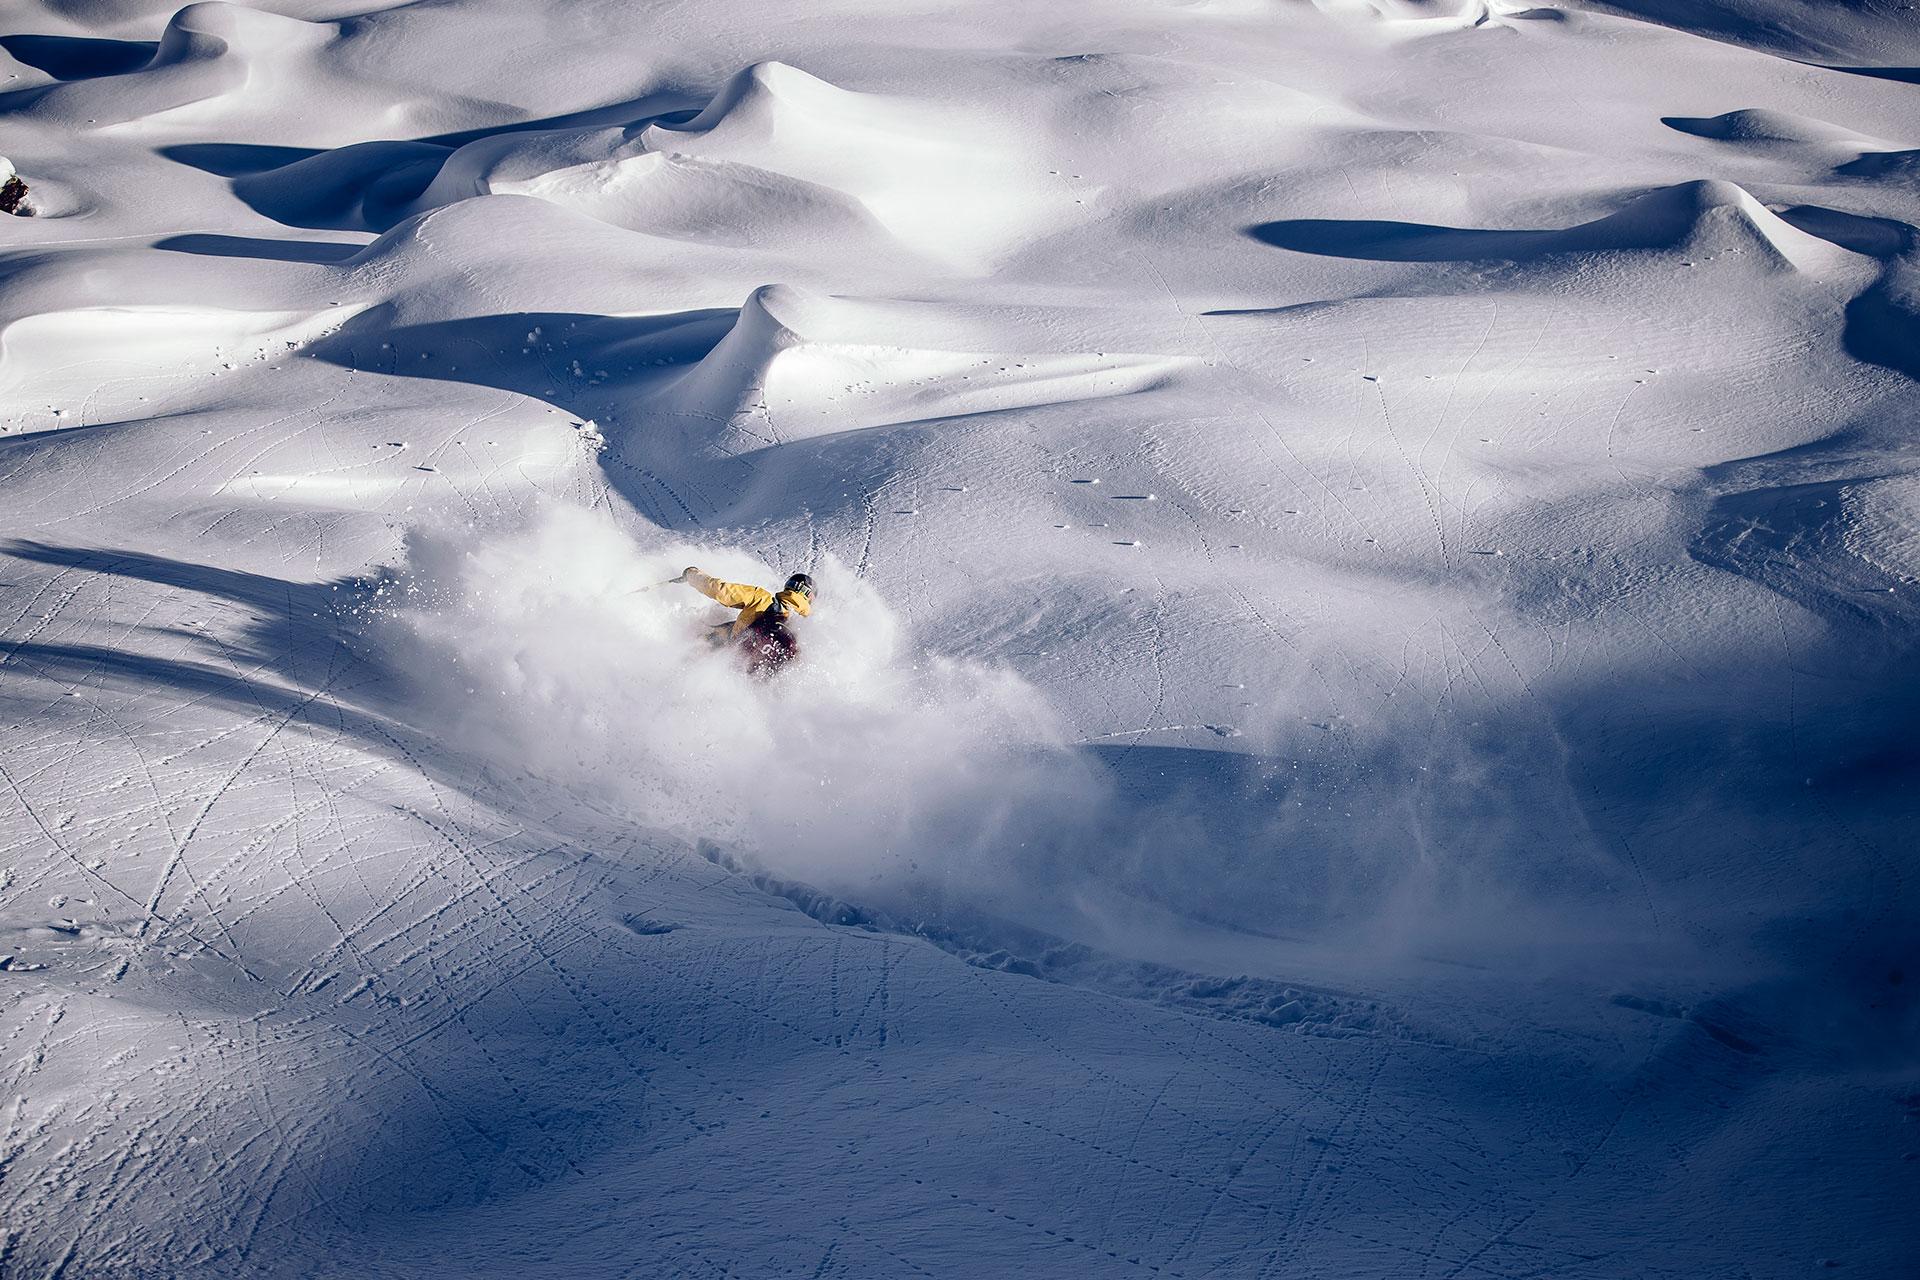 Fotograf Ski Snowboard Freeride Powder Hamburg Michael Müller